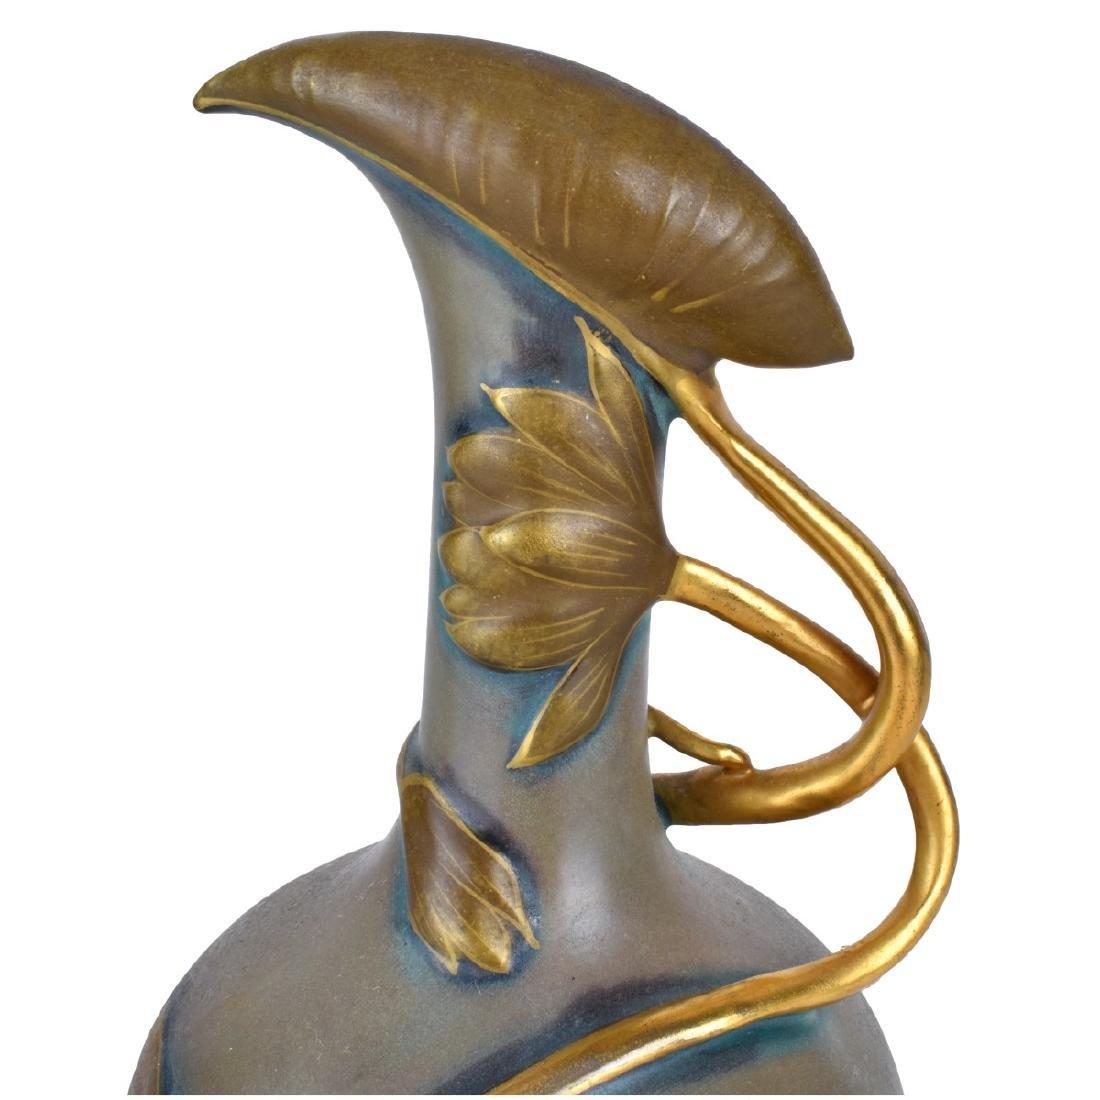 Turn Teplitz Pottery Pitchers and Vase - 3